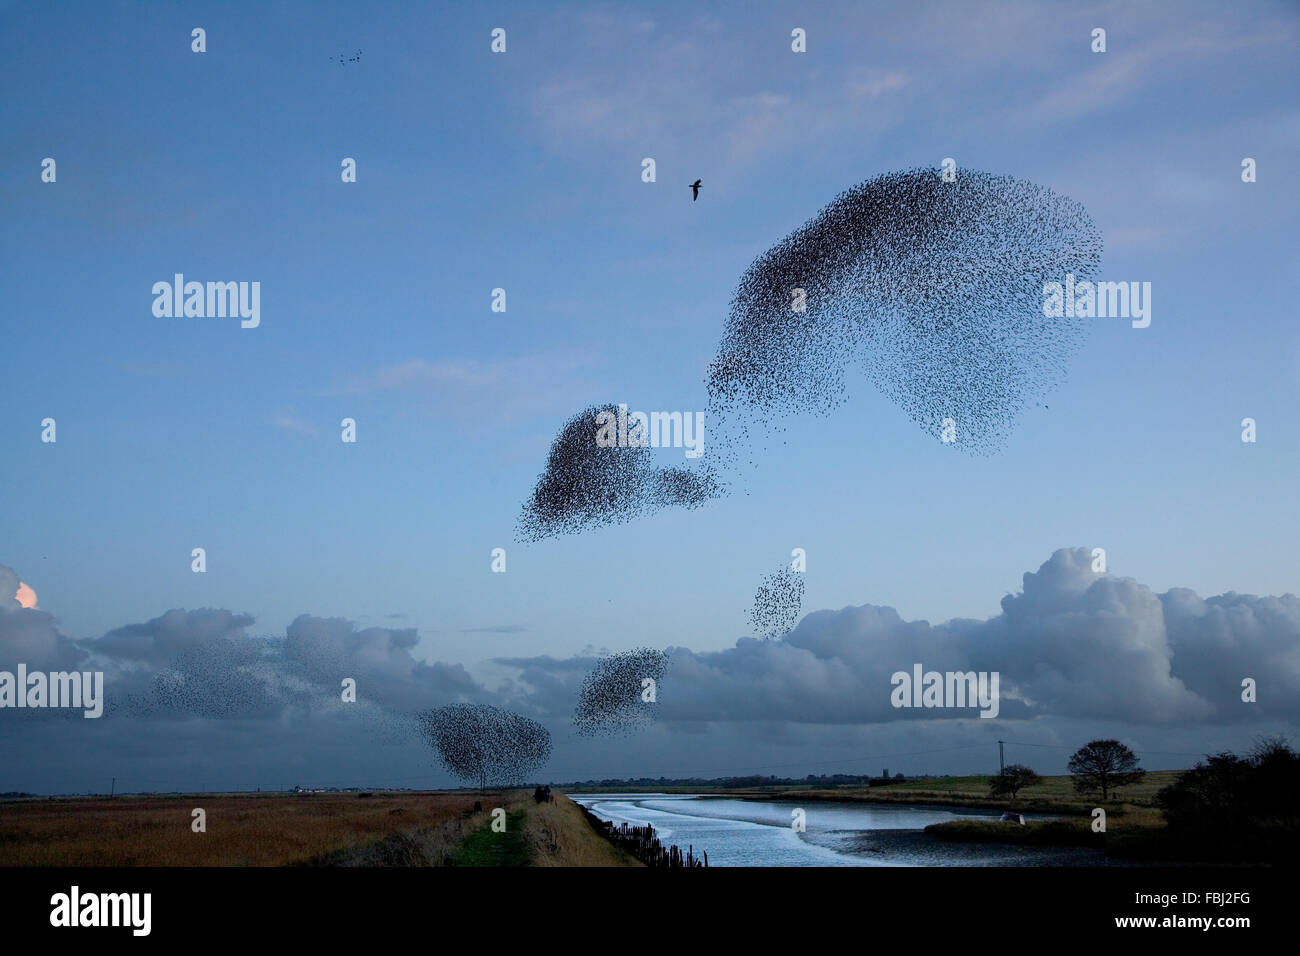 Starlings (Sturnus vulgaris) at Hen reedbeds, in winter roosting flight, with Herring gulls (Larus argentatus) accompanying - Stock Image